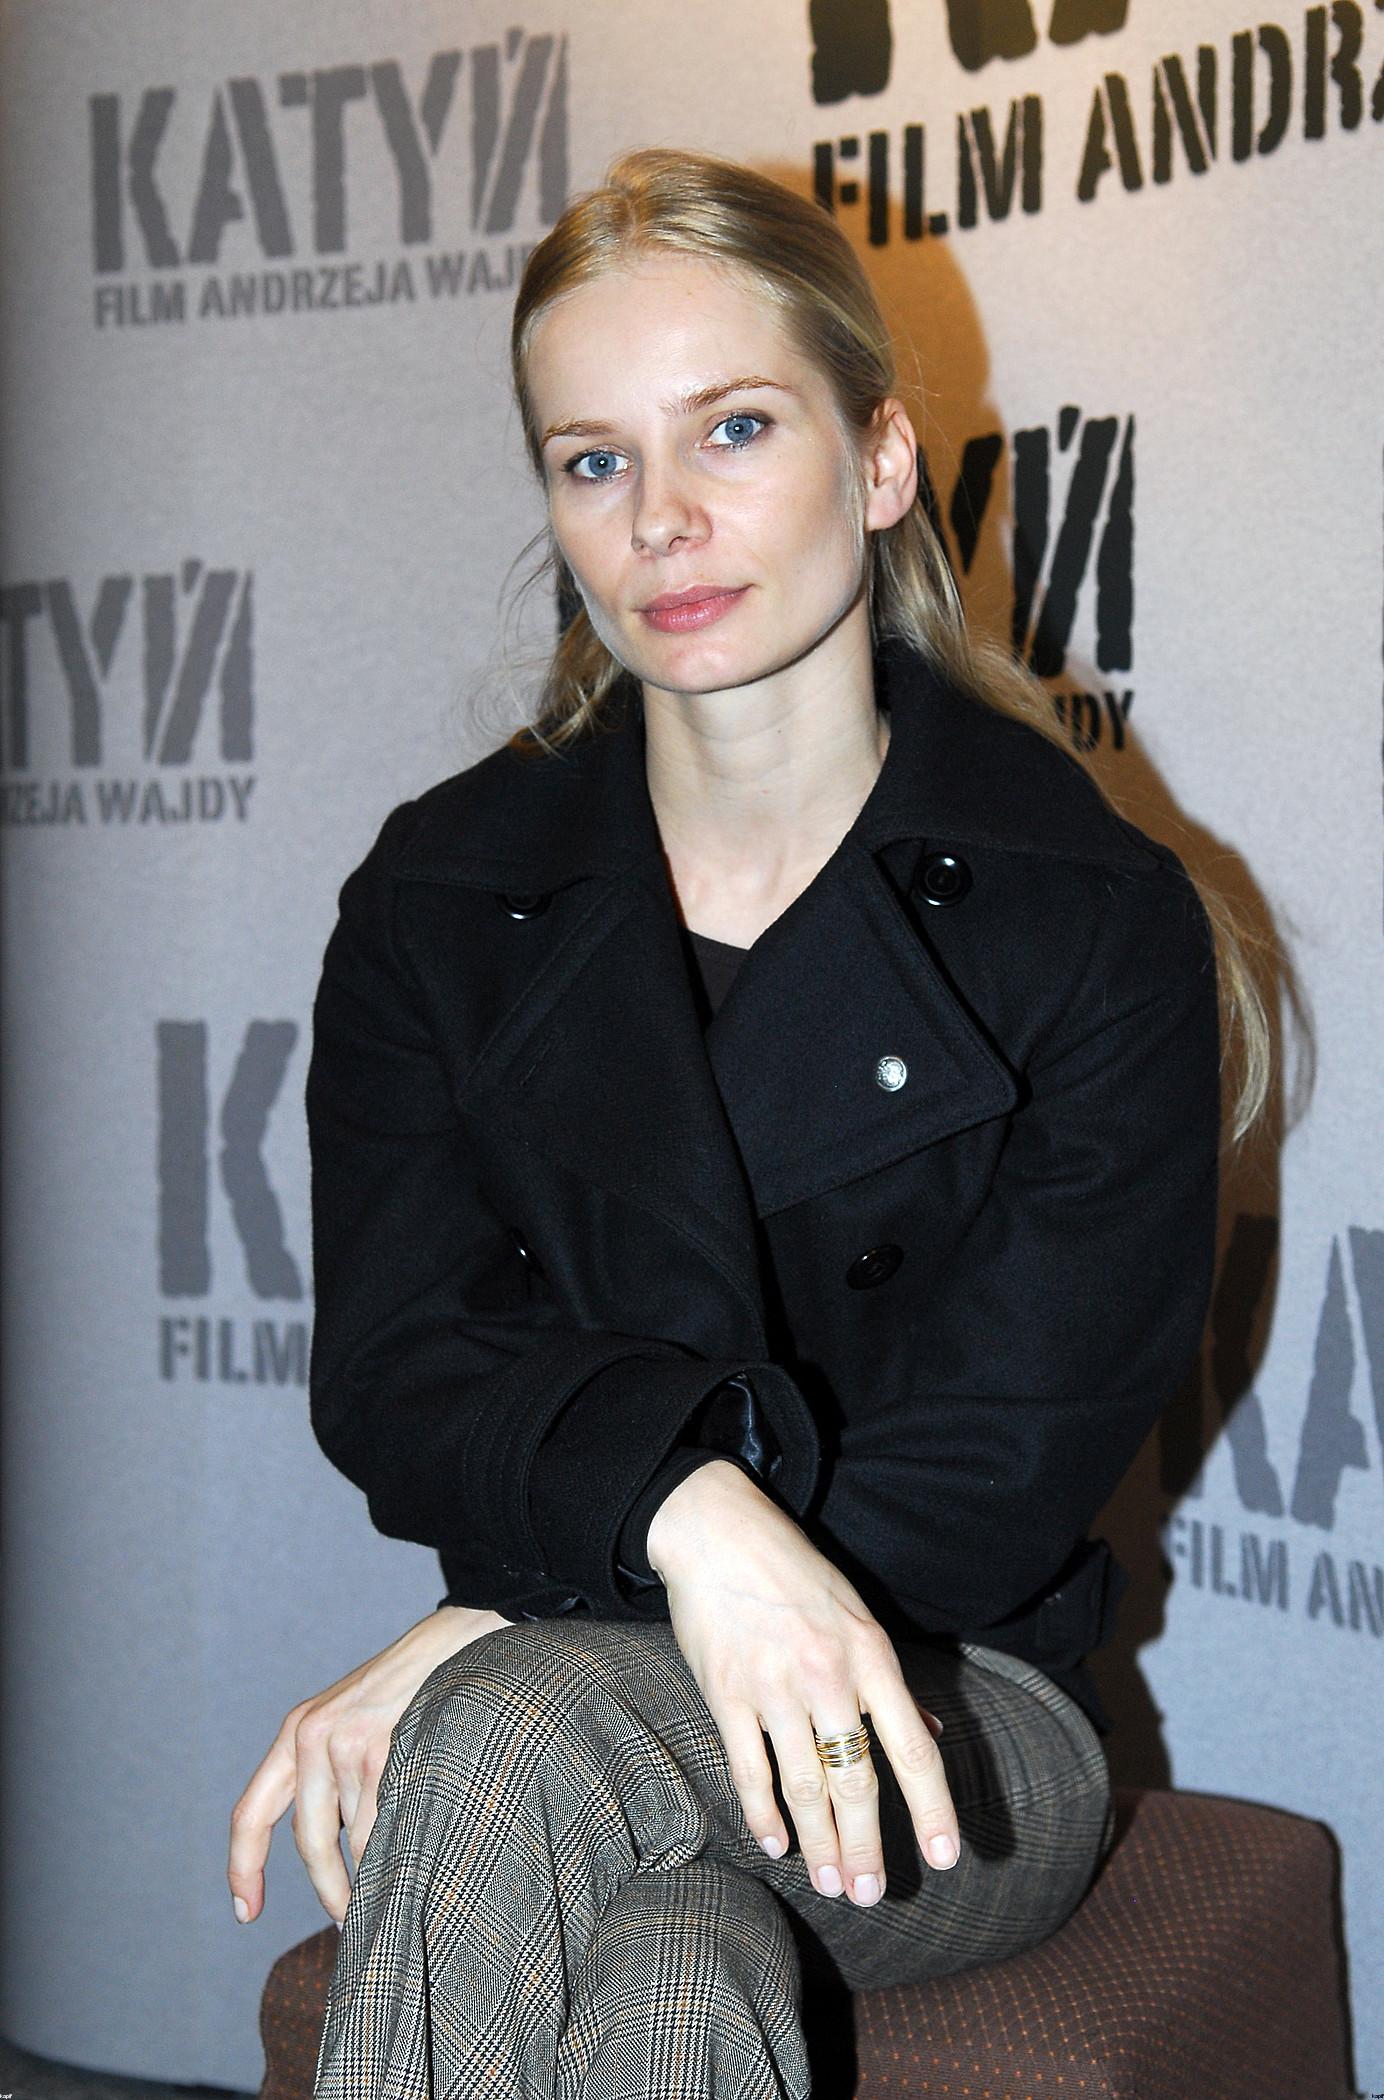 Fryzury Magdaleny Cieleckiej